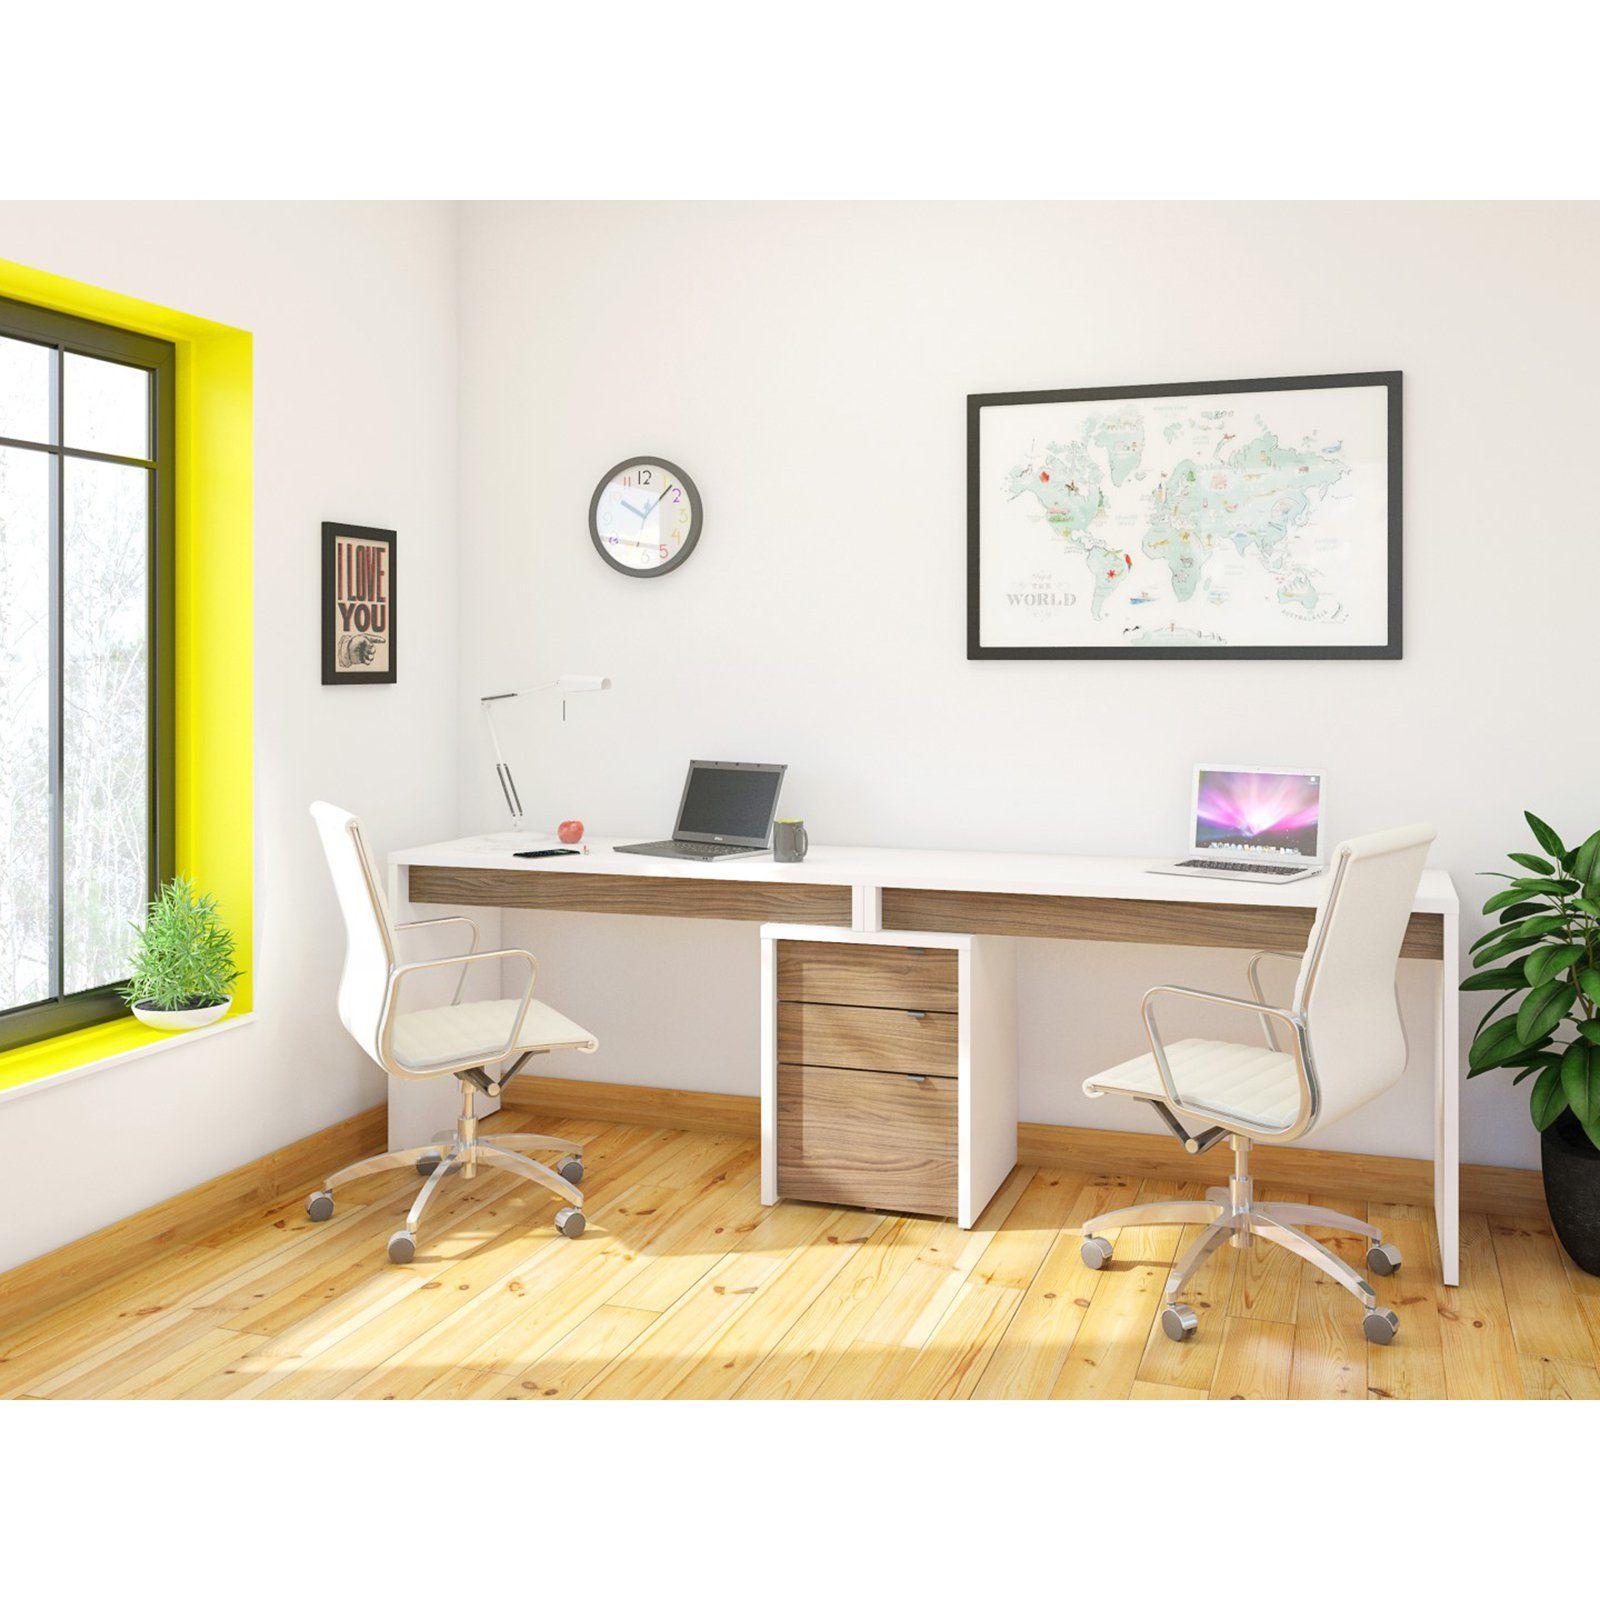 Nexera Liber T 2 Person Desk With Filing Cabinet White And Espresso Cheap Office Furniture Home Office Desks Home Office Design